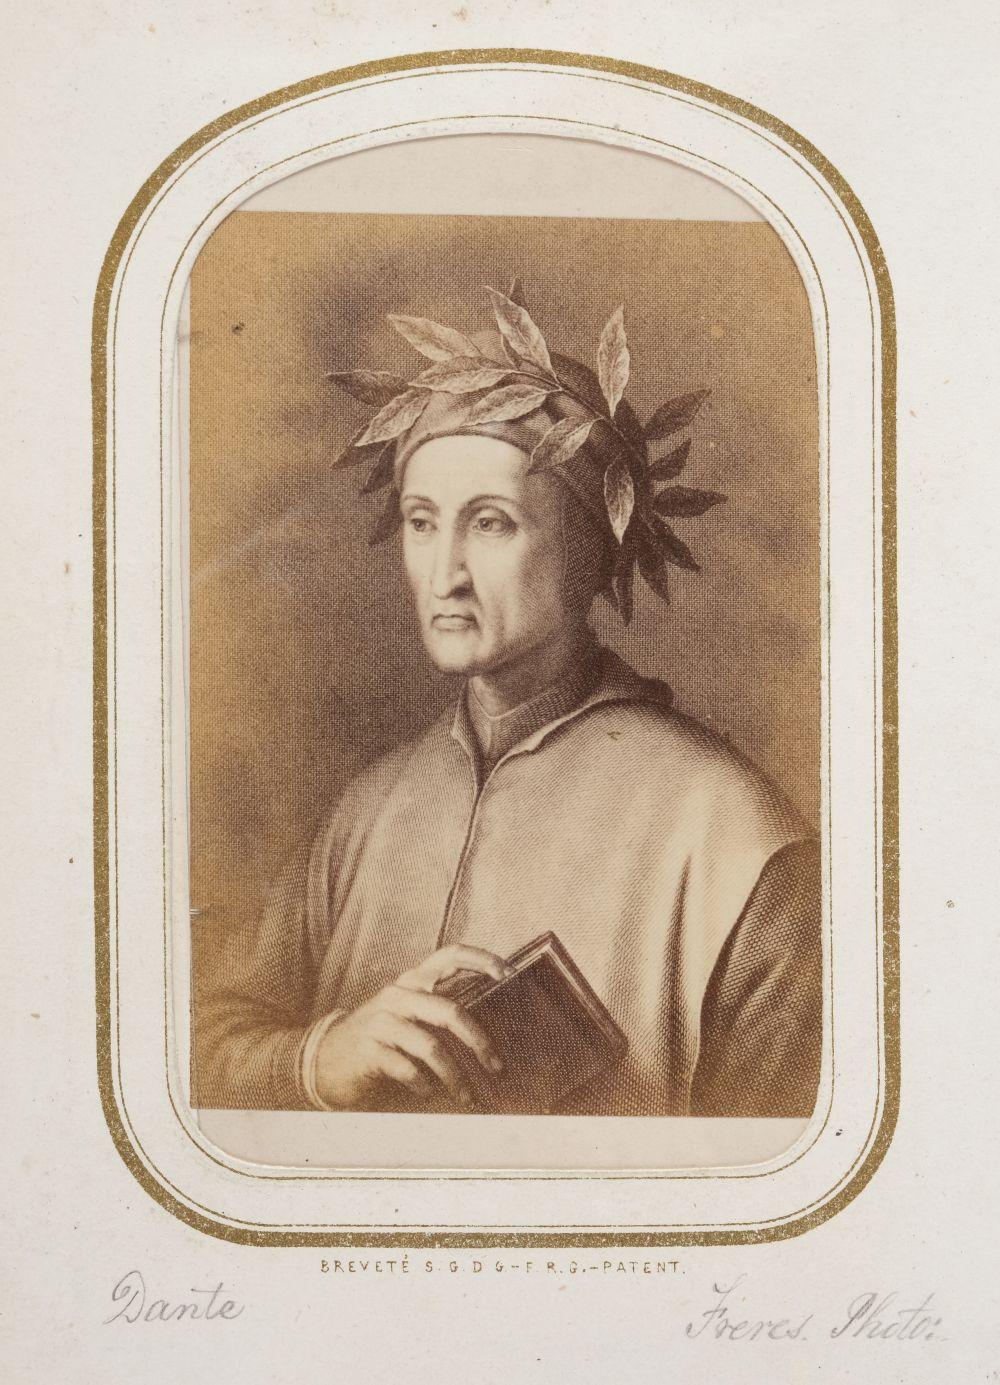 * Cartes de visite. A cartes-de-visite album, c. 1860s/1880s - Image 13 of 18